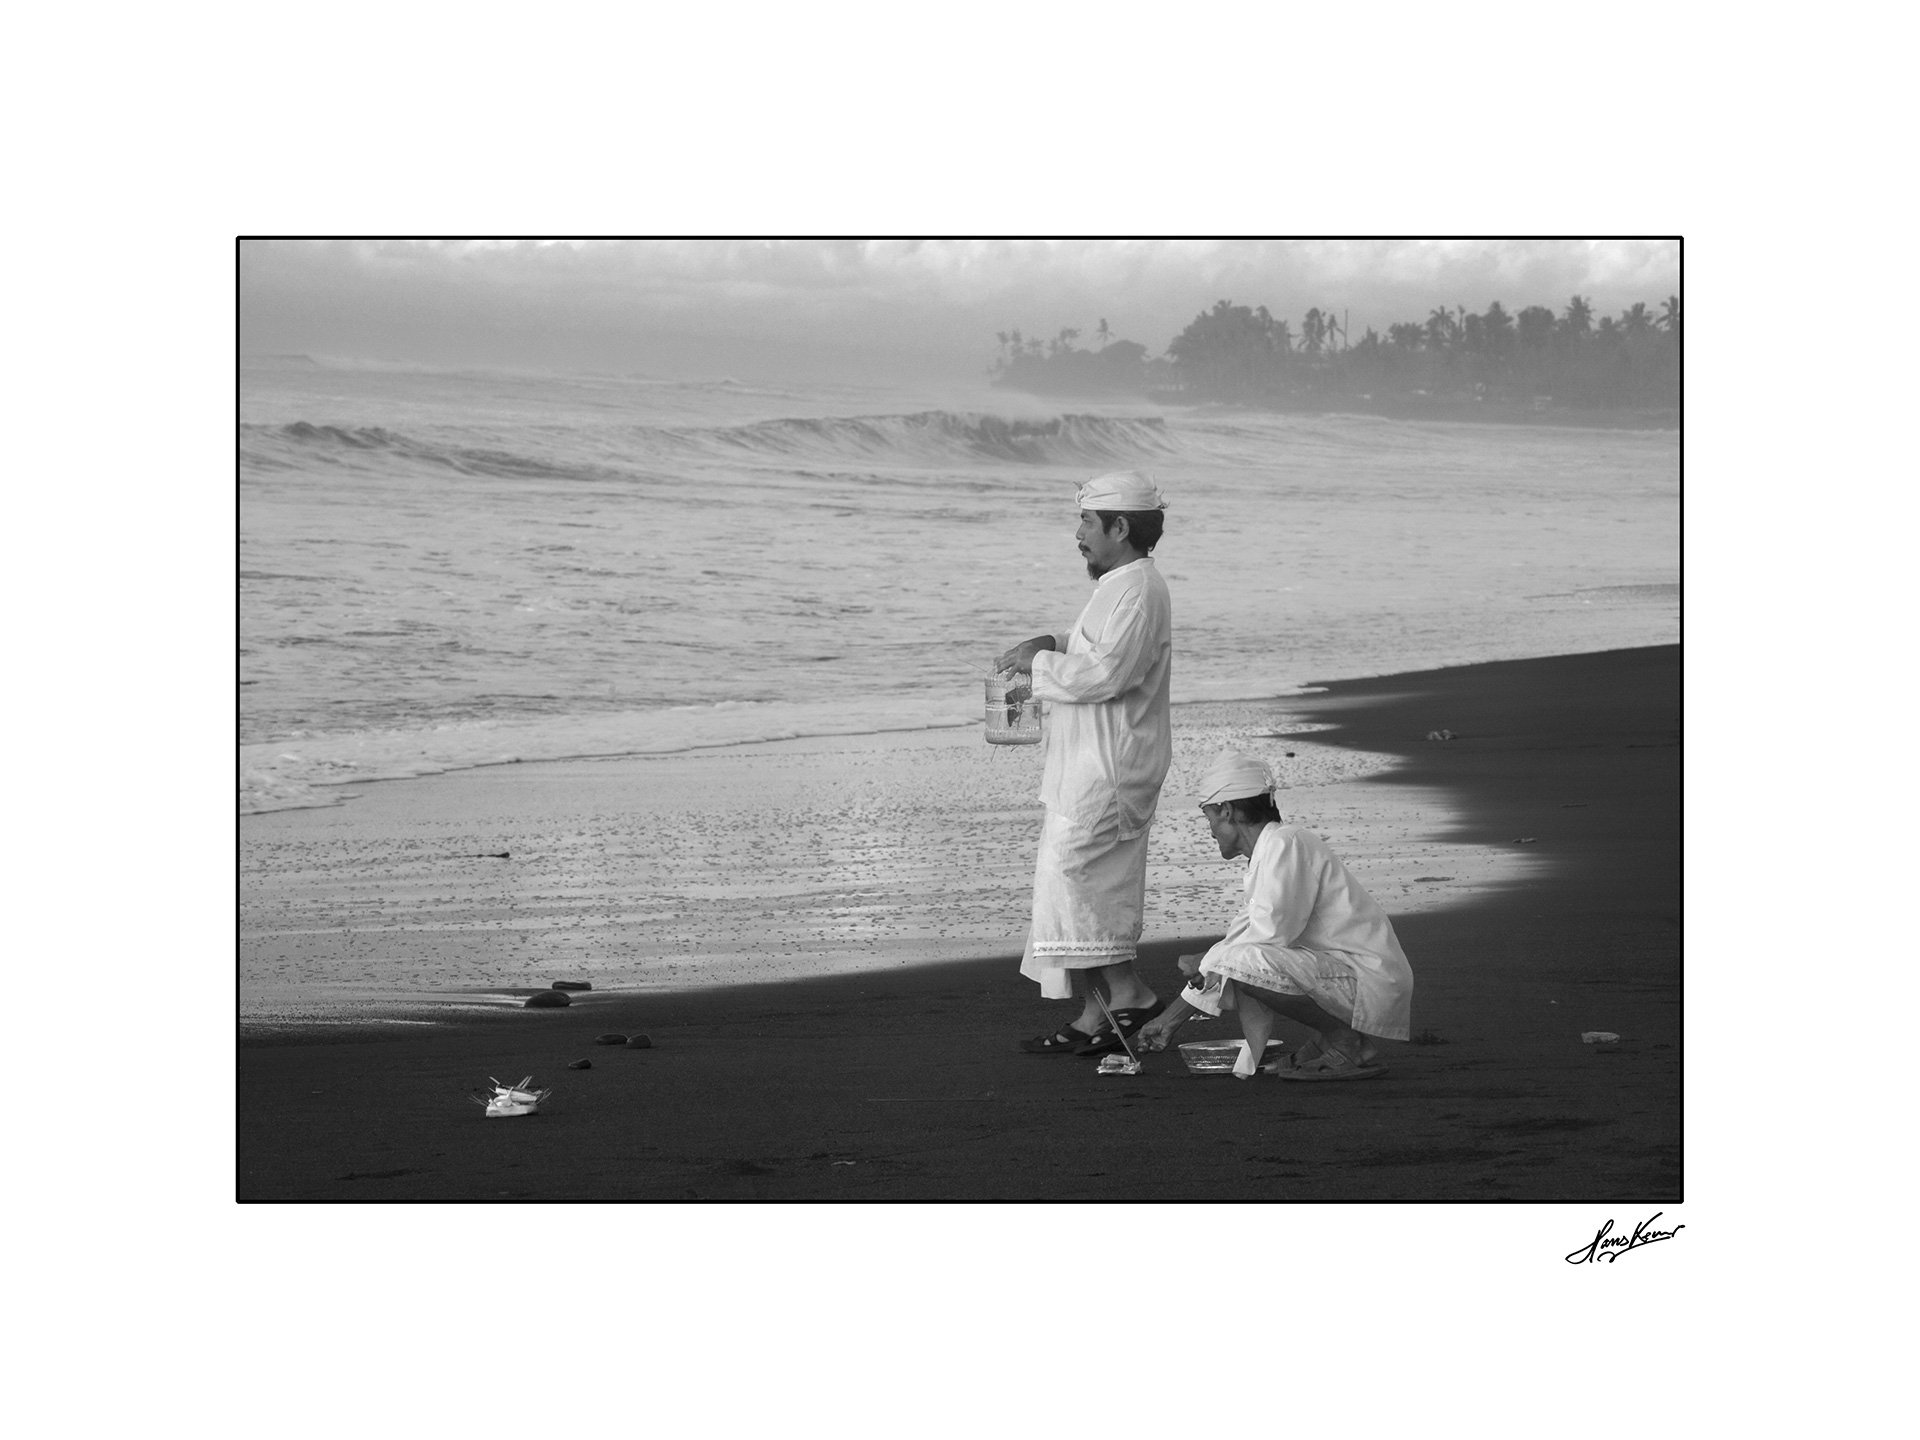 Priests praying on Purnami Beach in Bali, 2009